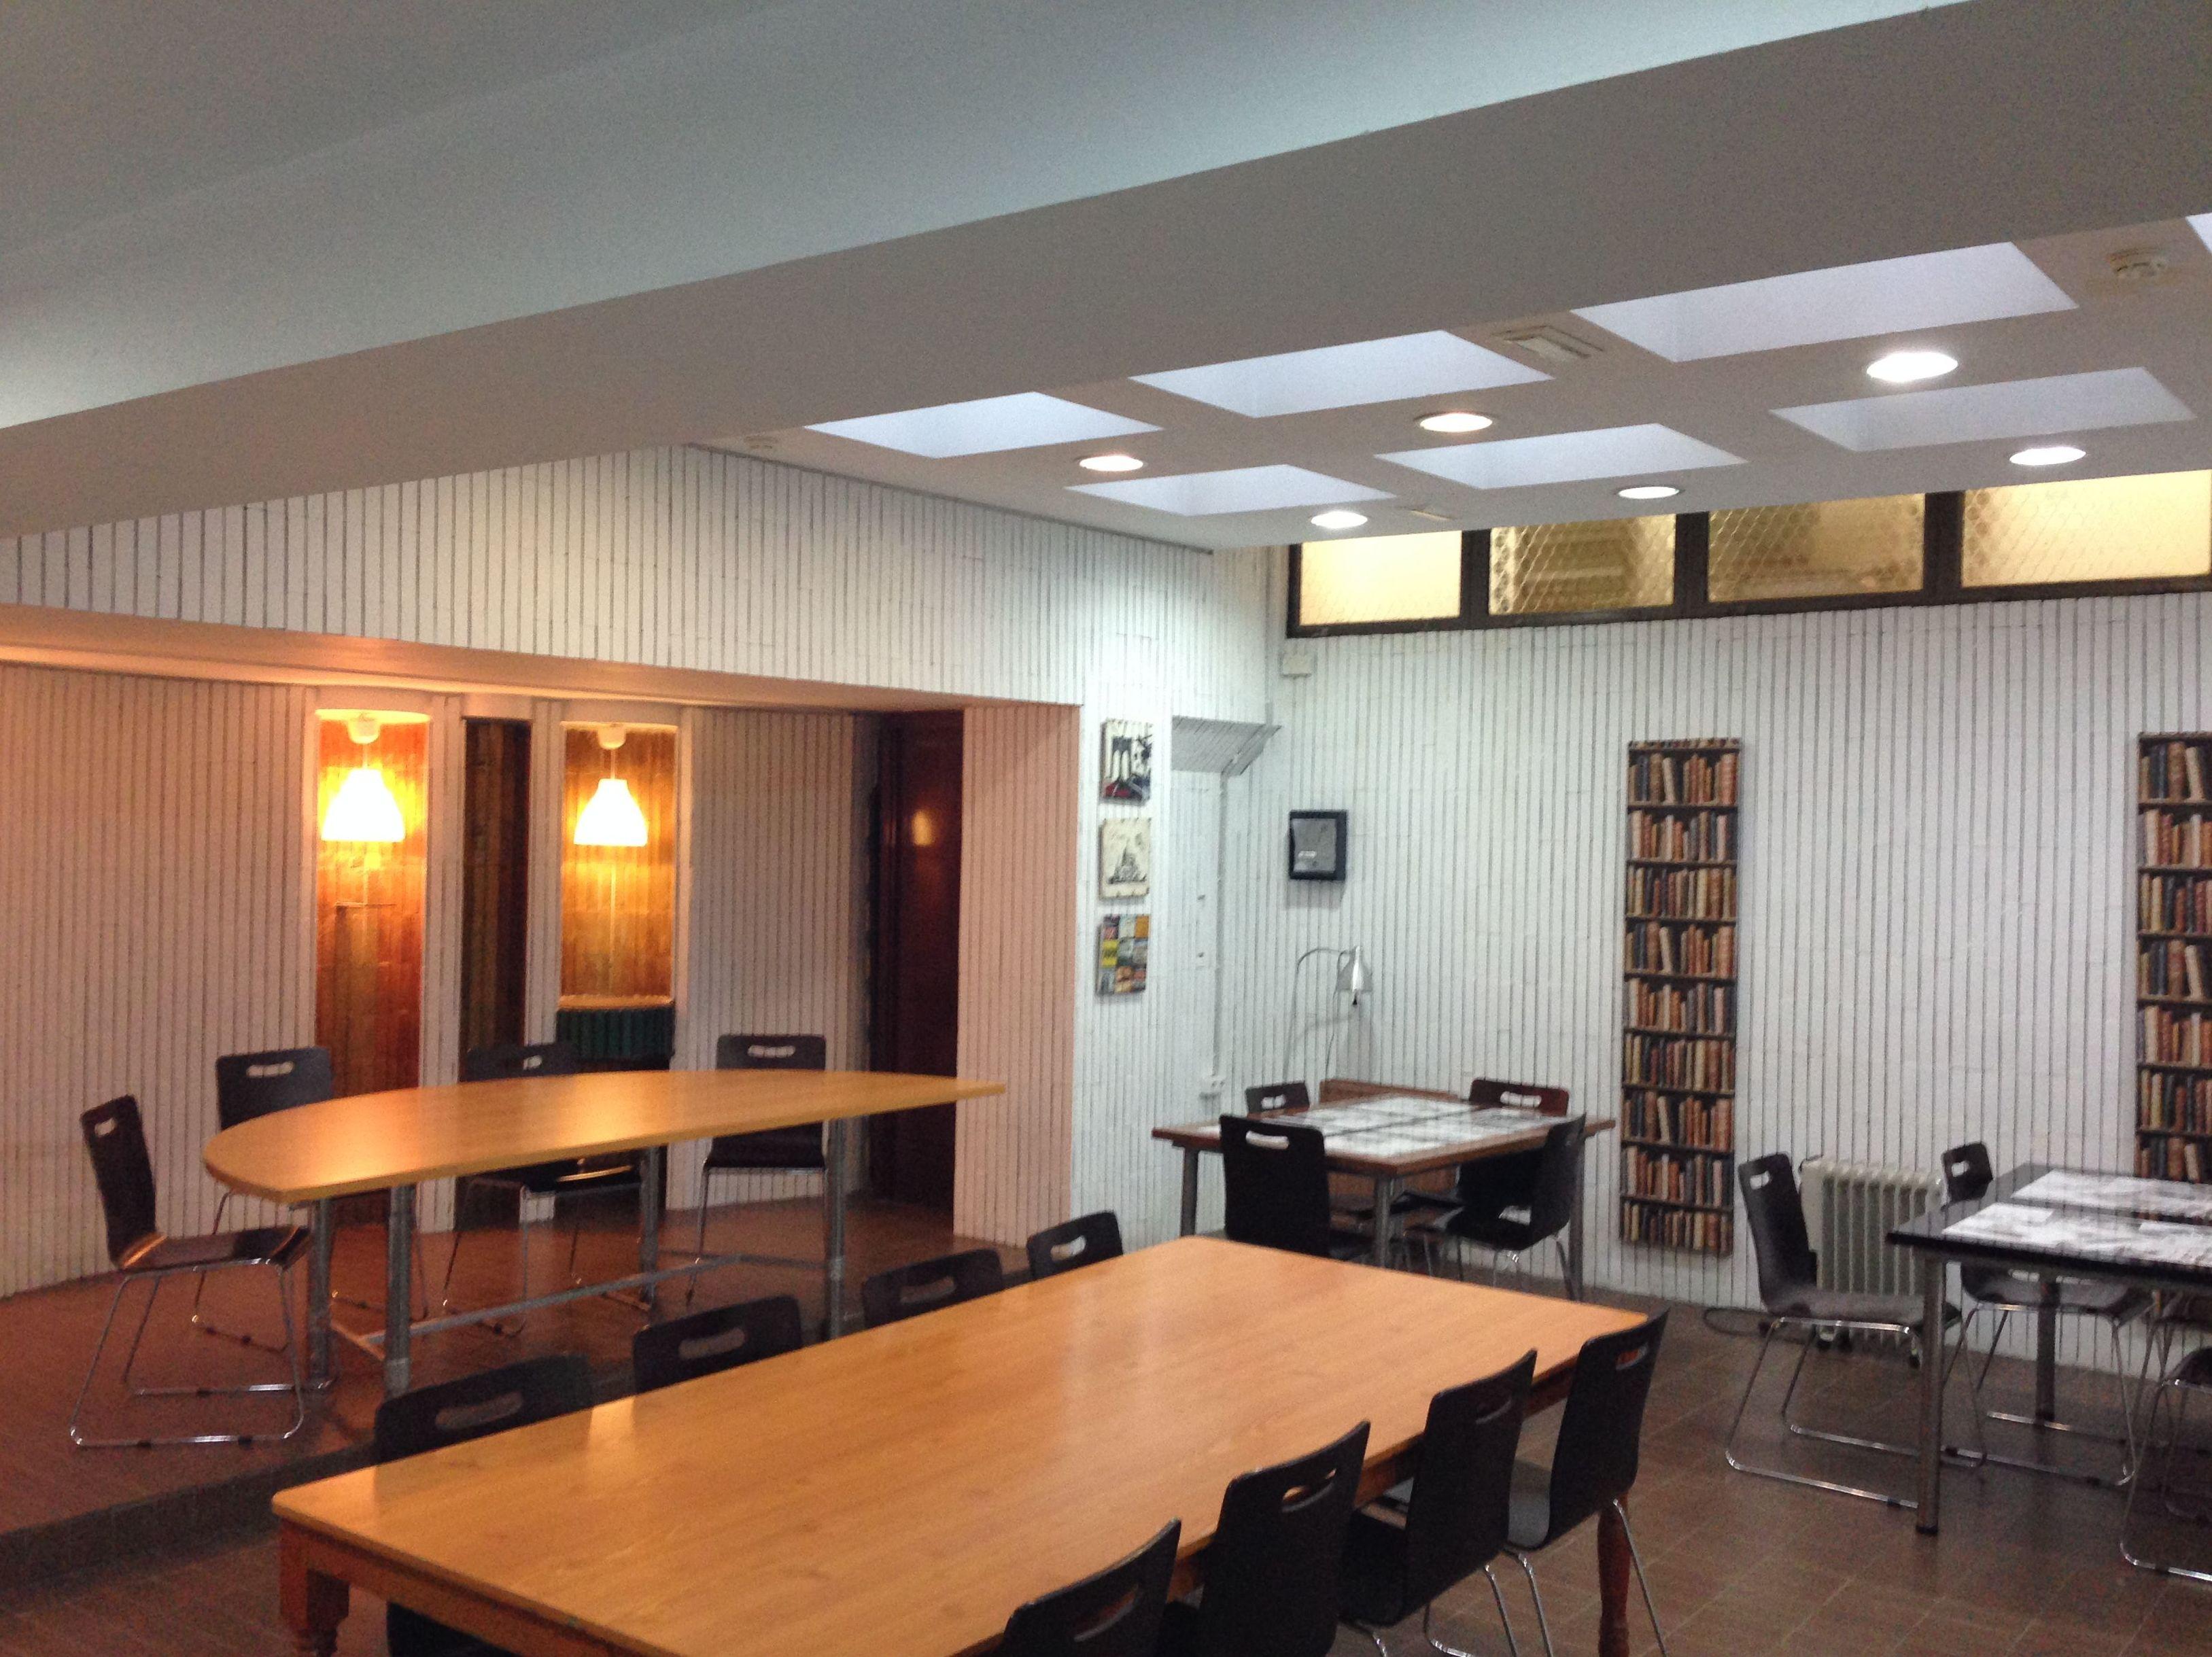 SALON DE ESTUDIO: RESERVA TU PLAZA  de Residencia de Estudiantes Cádiz Centro